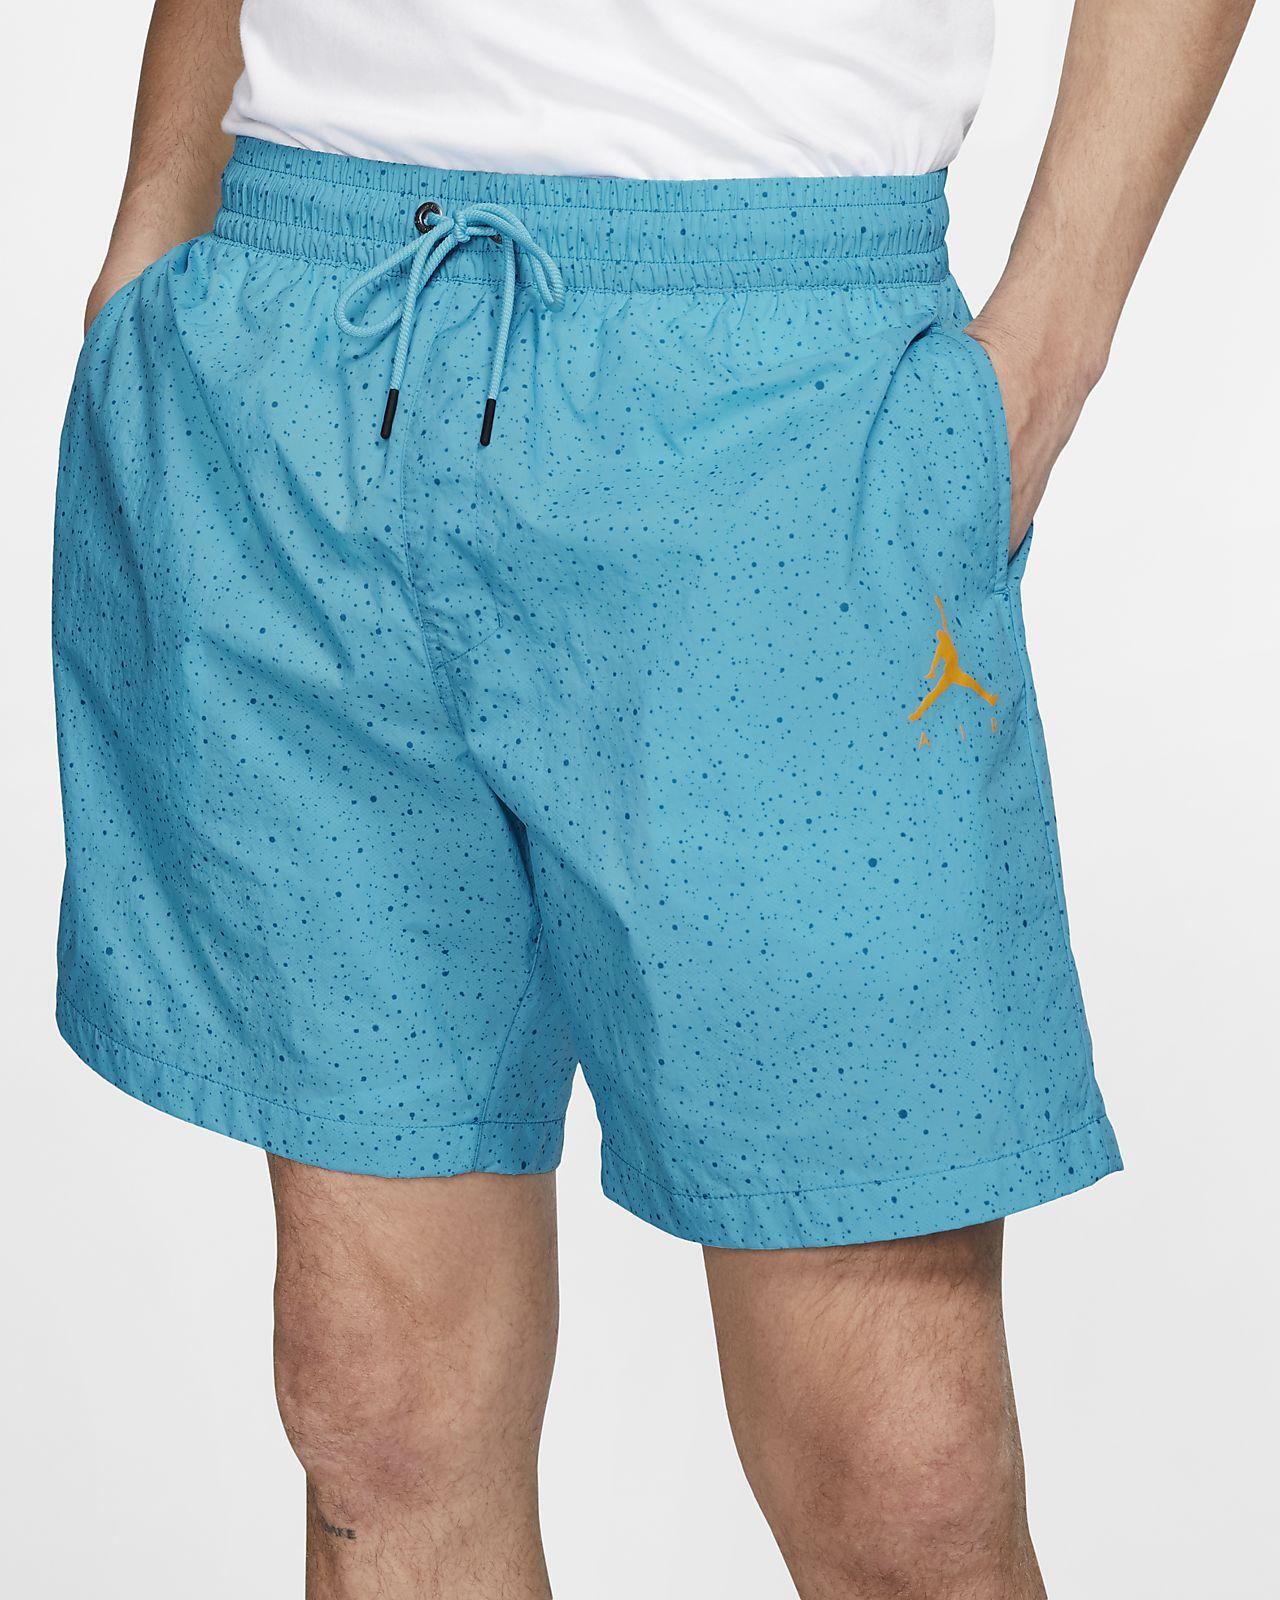 Jordan Jumpman Cement Poolside Men's 18cm approx. Shorts